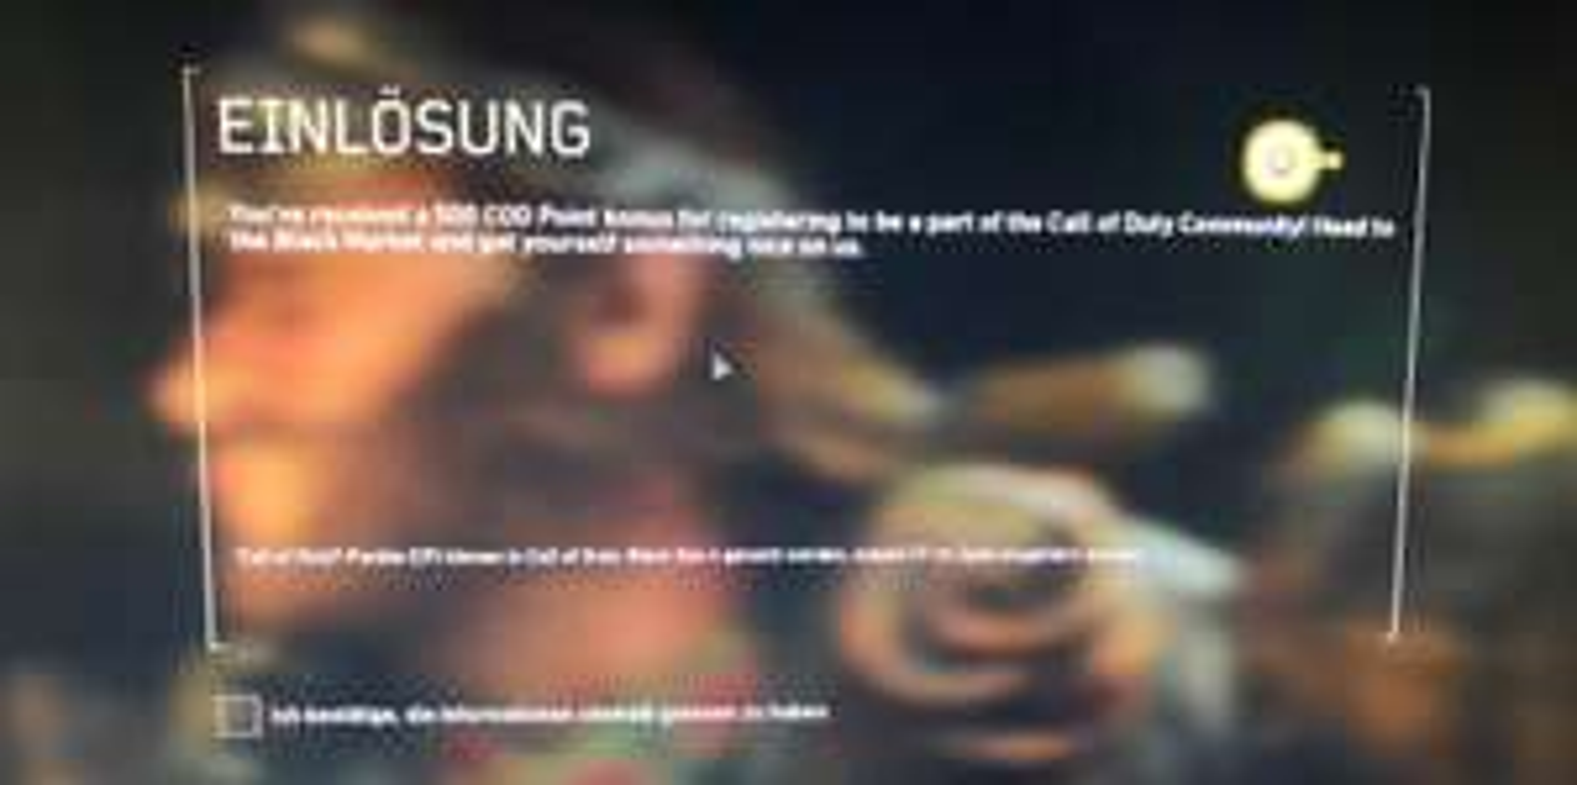 Call of Duty Black Ops 4 - 500 Coins gratis (Companion App)